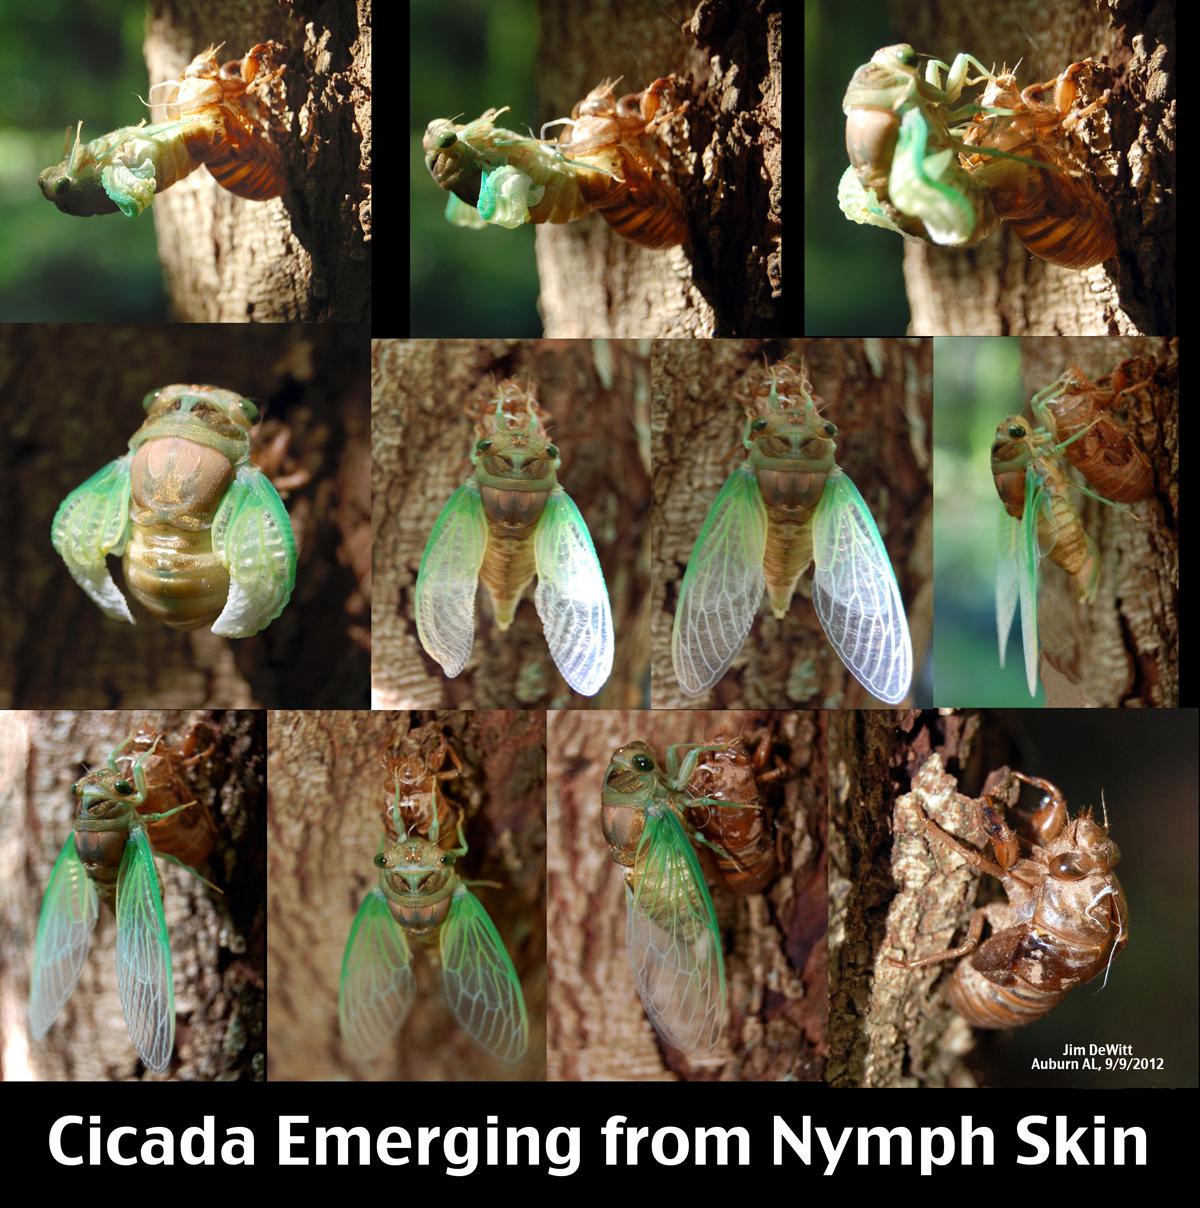 Adult Tzitzika emerging from Nymph Skin